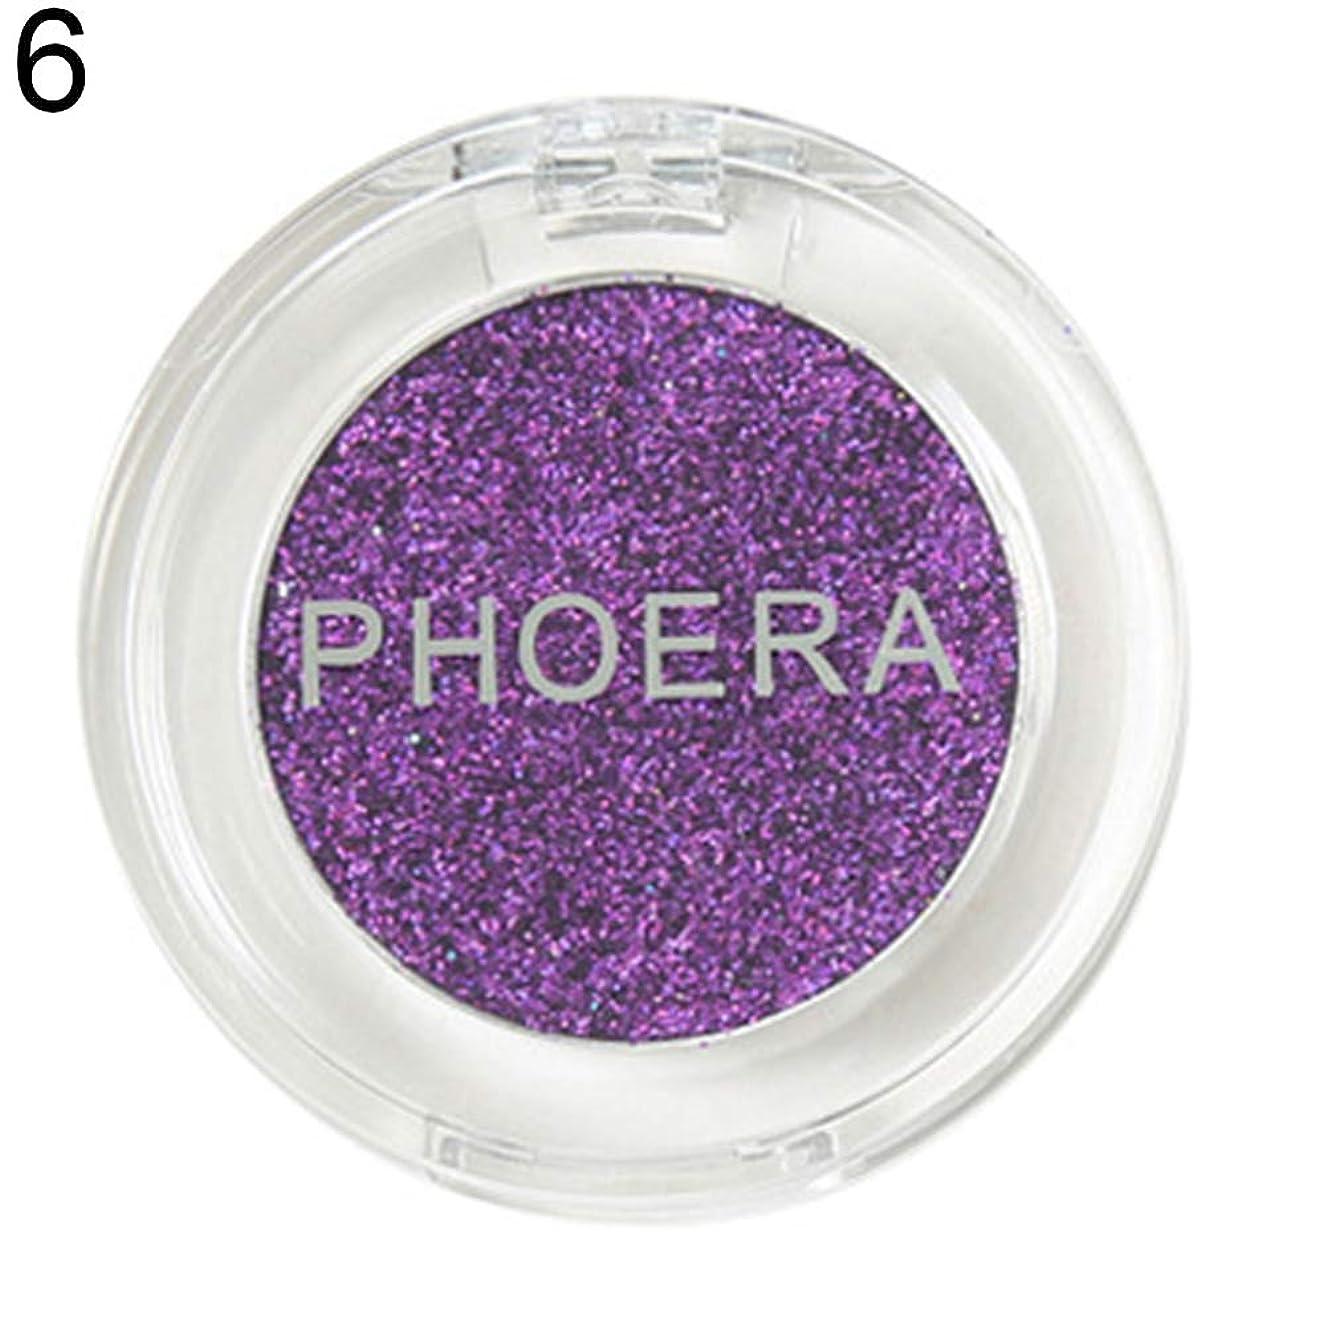 wewa98698 PHOERA Shimmer Sequins Eyeshadow Powder Glitter Long Lasting Brightening Makeup for Women - 6